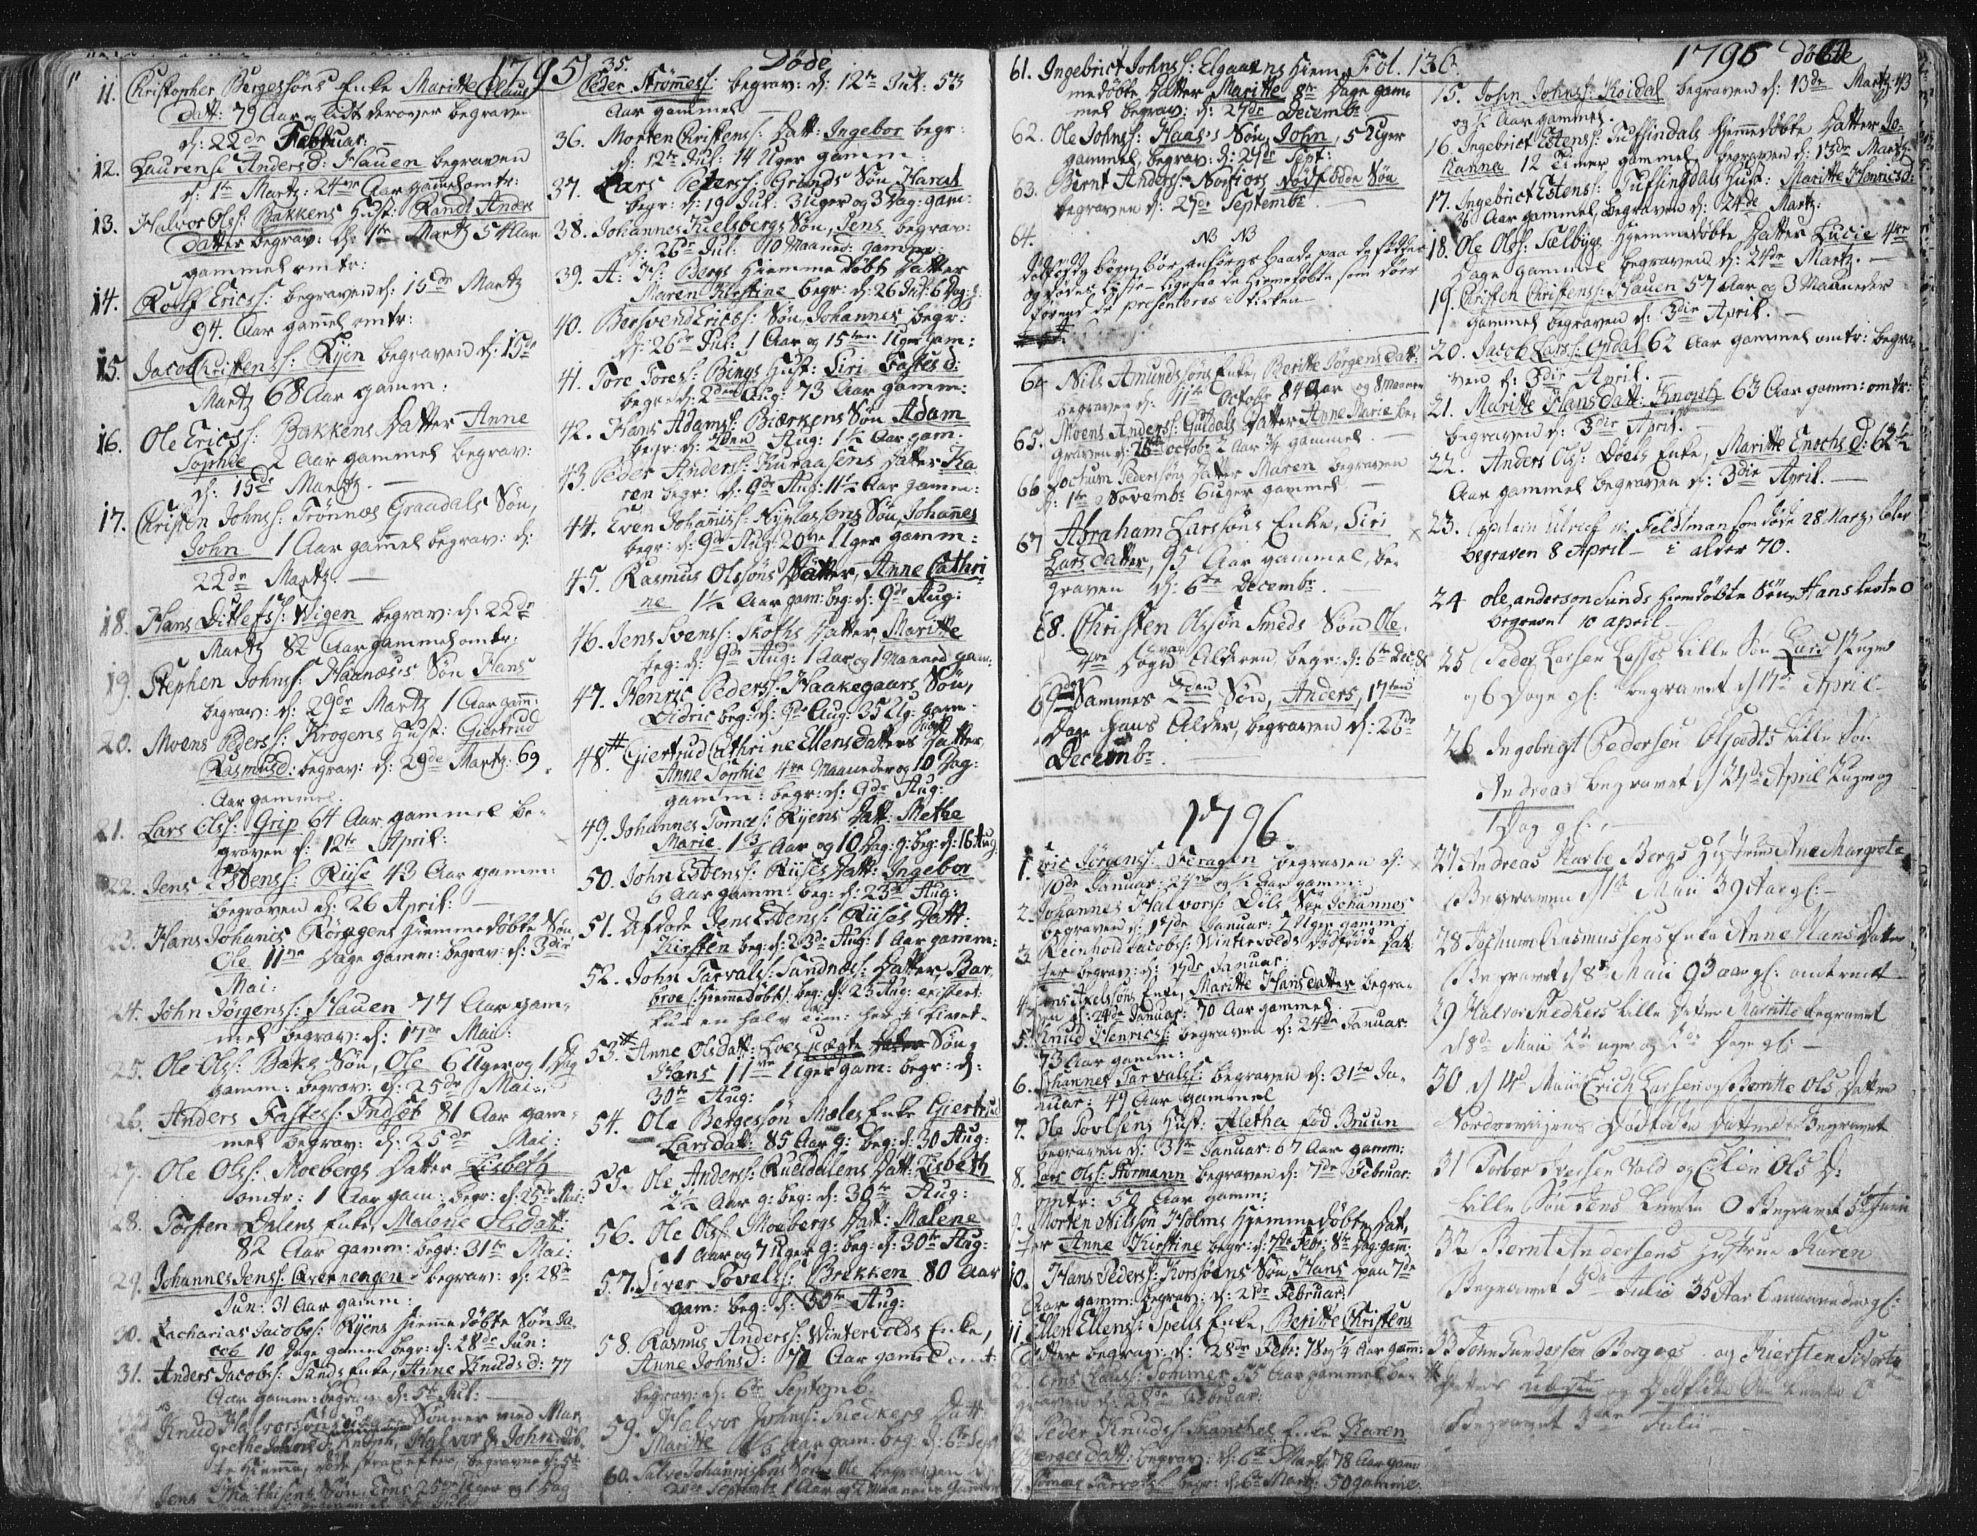 SAT, Ministerialprotokoller, klokkerbøker og fødselsregistre - Sør-Trøndelag, 681/L0926: Parish register (official) no. 681A04, 1767-1797, p. 136